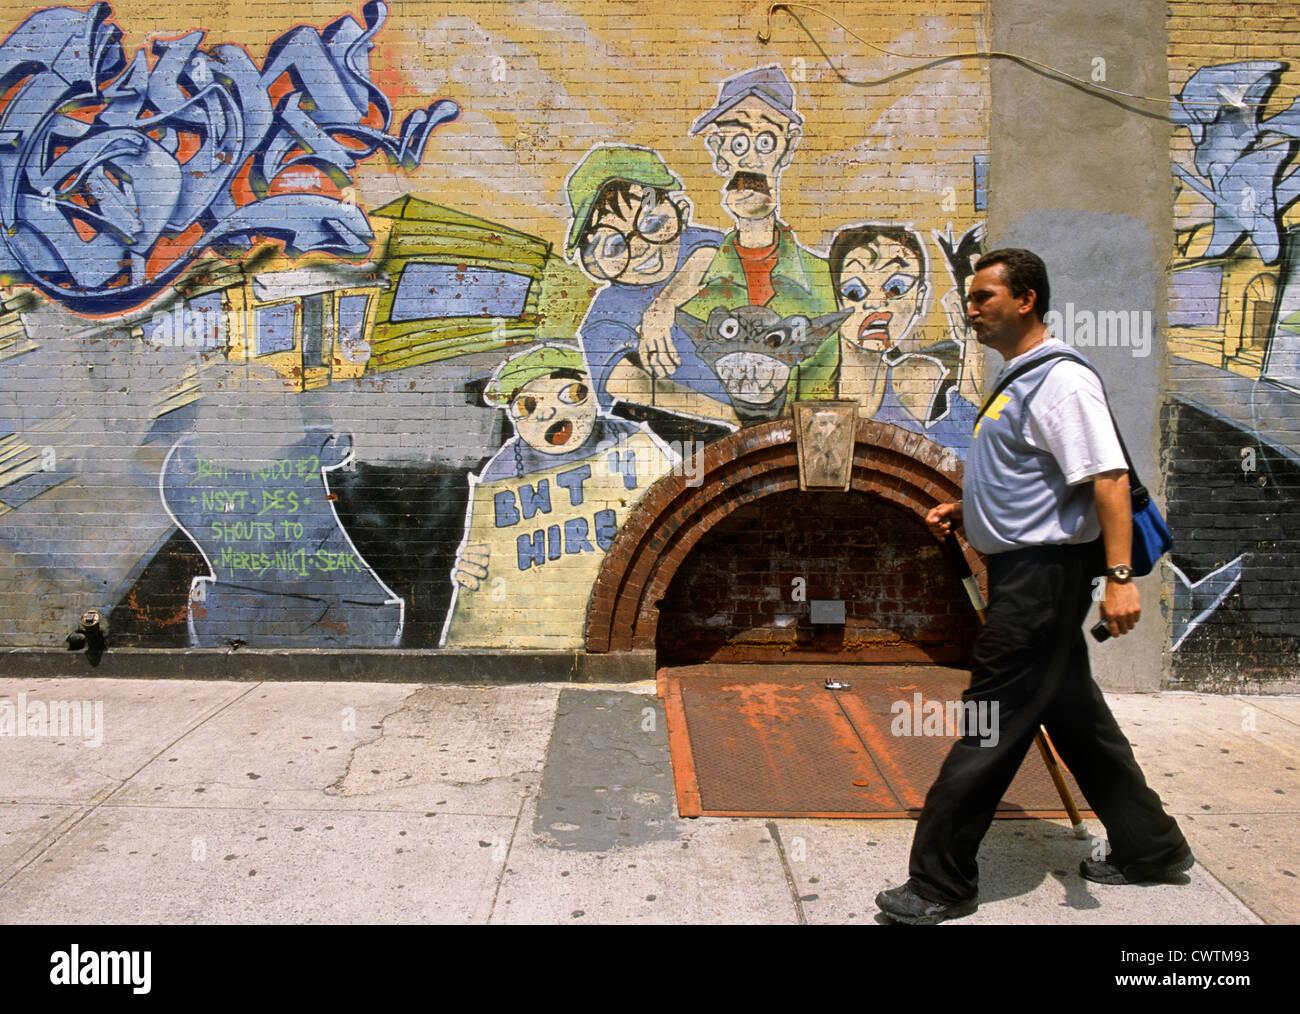 Graffiti wall usa - New York East Spanish Harlem Graffiti Wall Painting In The Barrio Usa